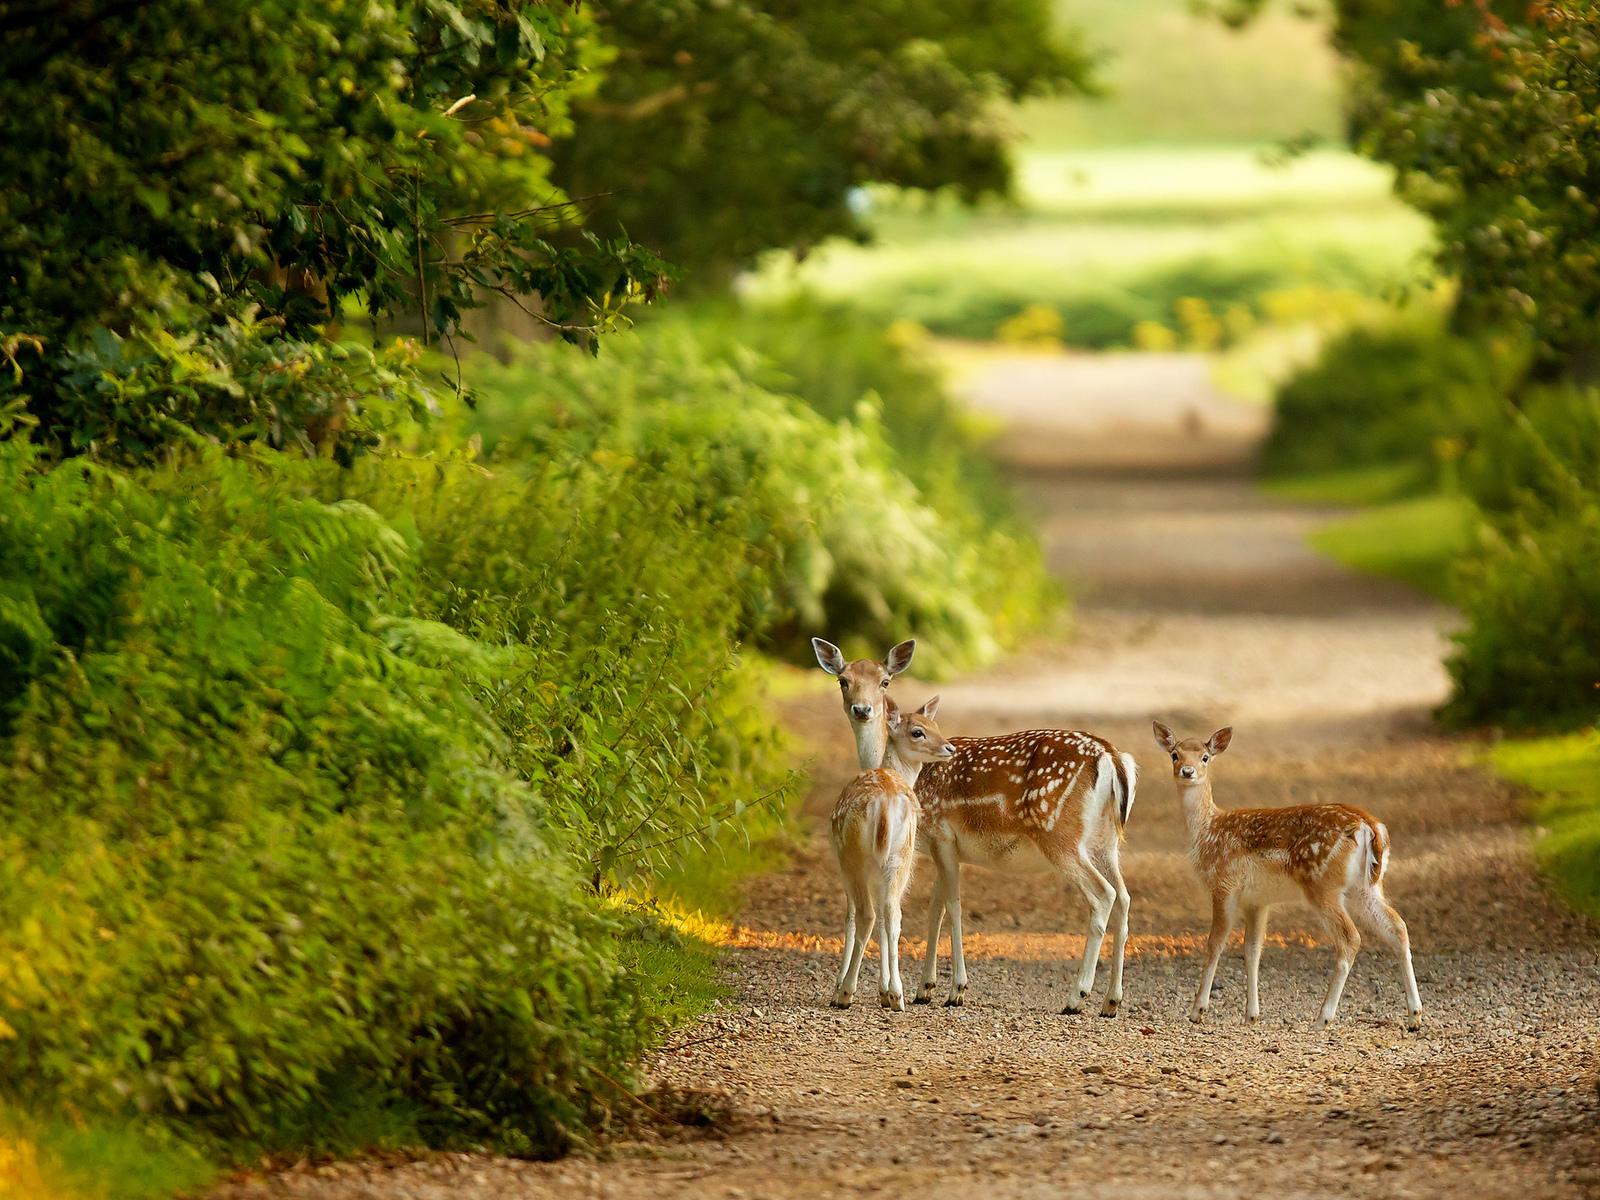 cute gazelle family looking at camera hd wallpaper | hd nature